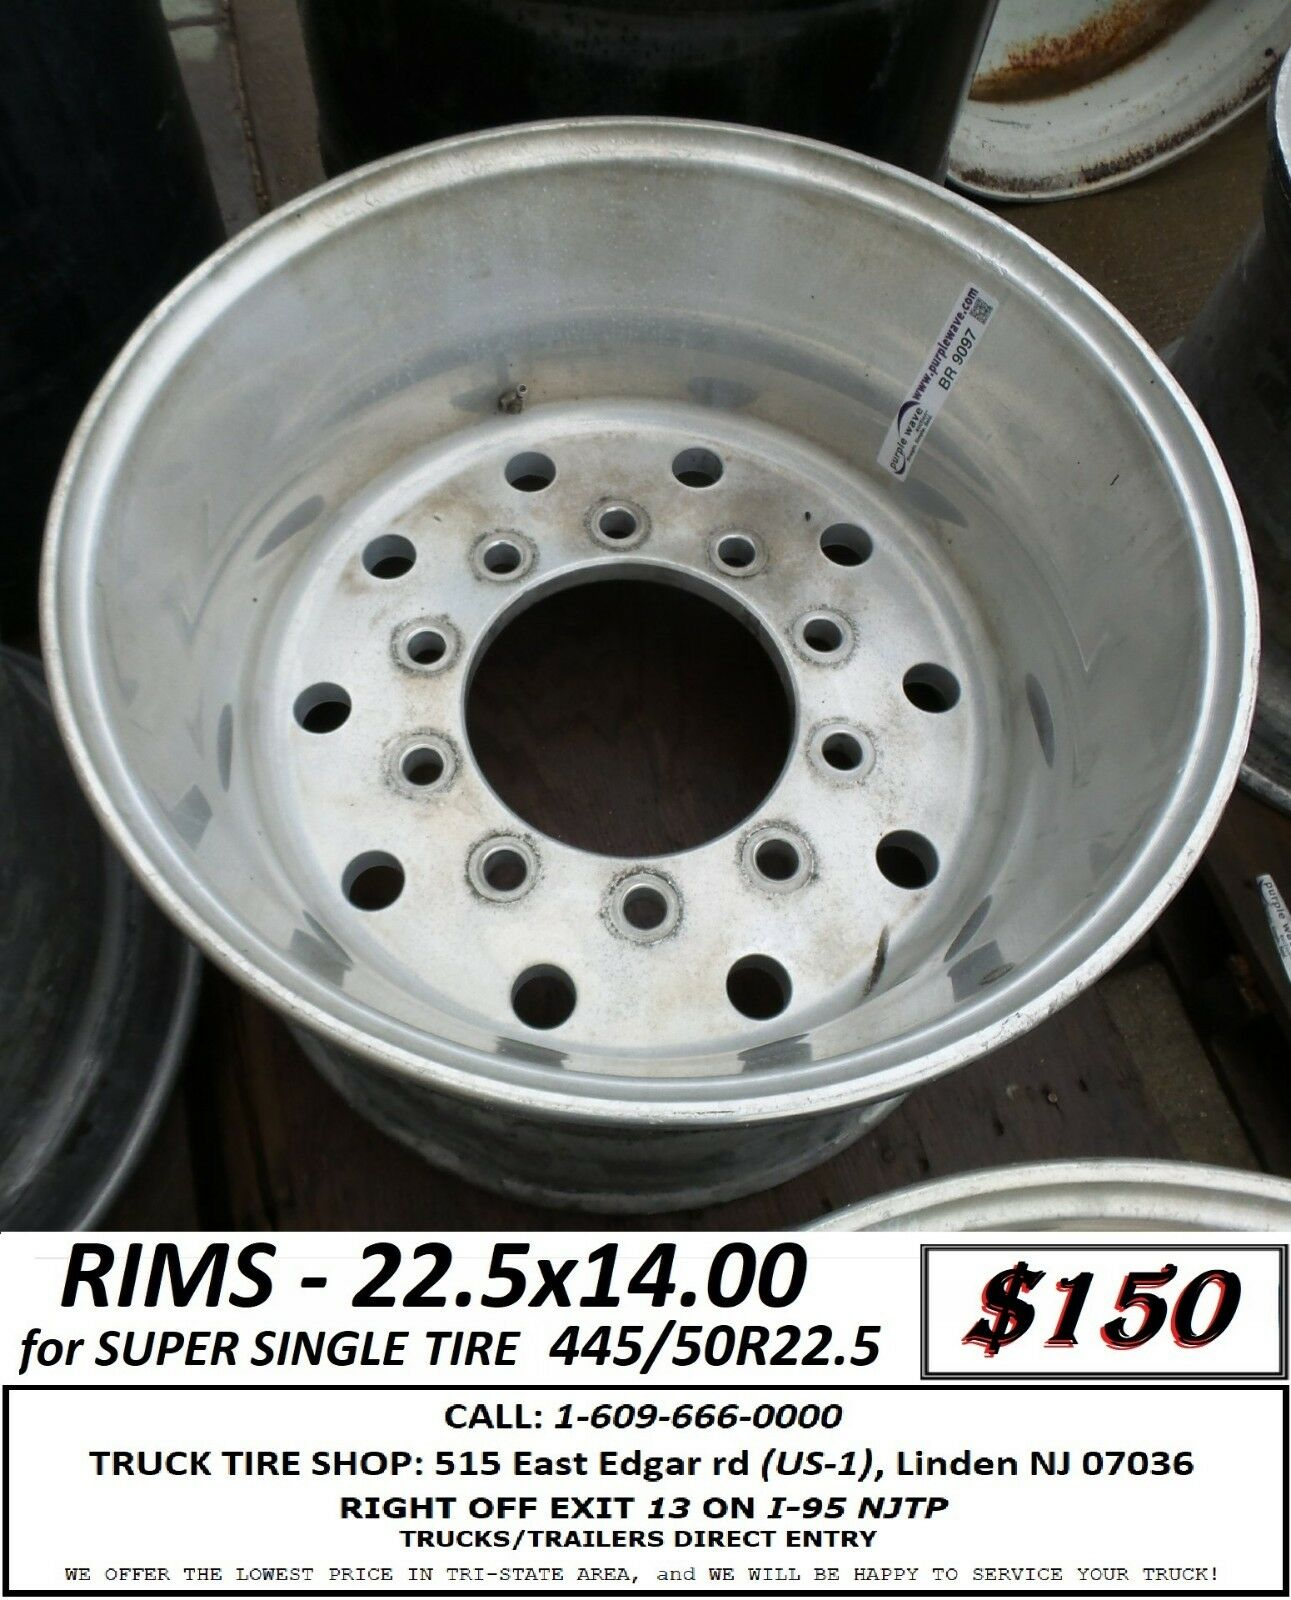 Super Single Tires For Sale : super, single, tires, TRUCK, 22.5x14.00, SUPER, SINGLE, 445/50R22.5, Alcoa, Online